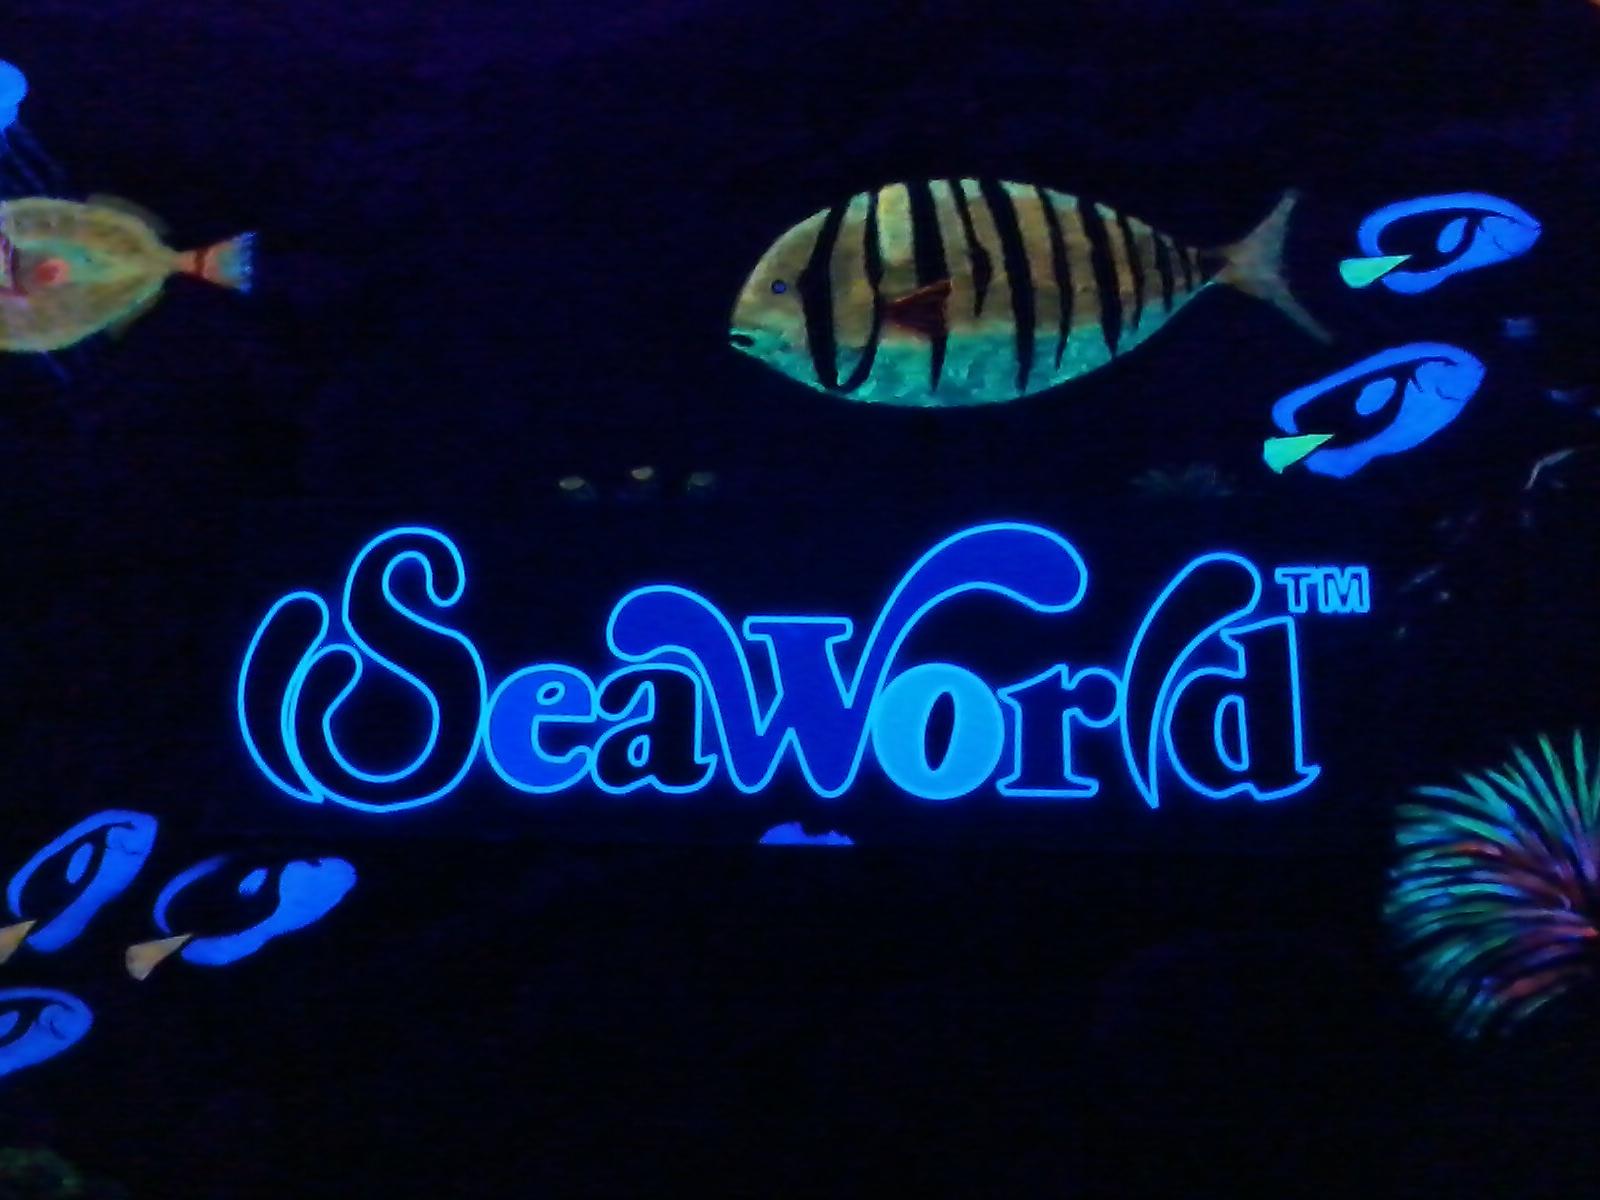 Seaworld ancol logo